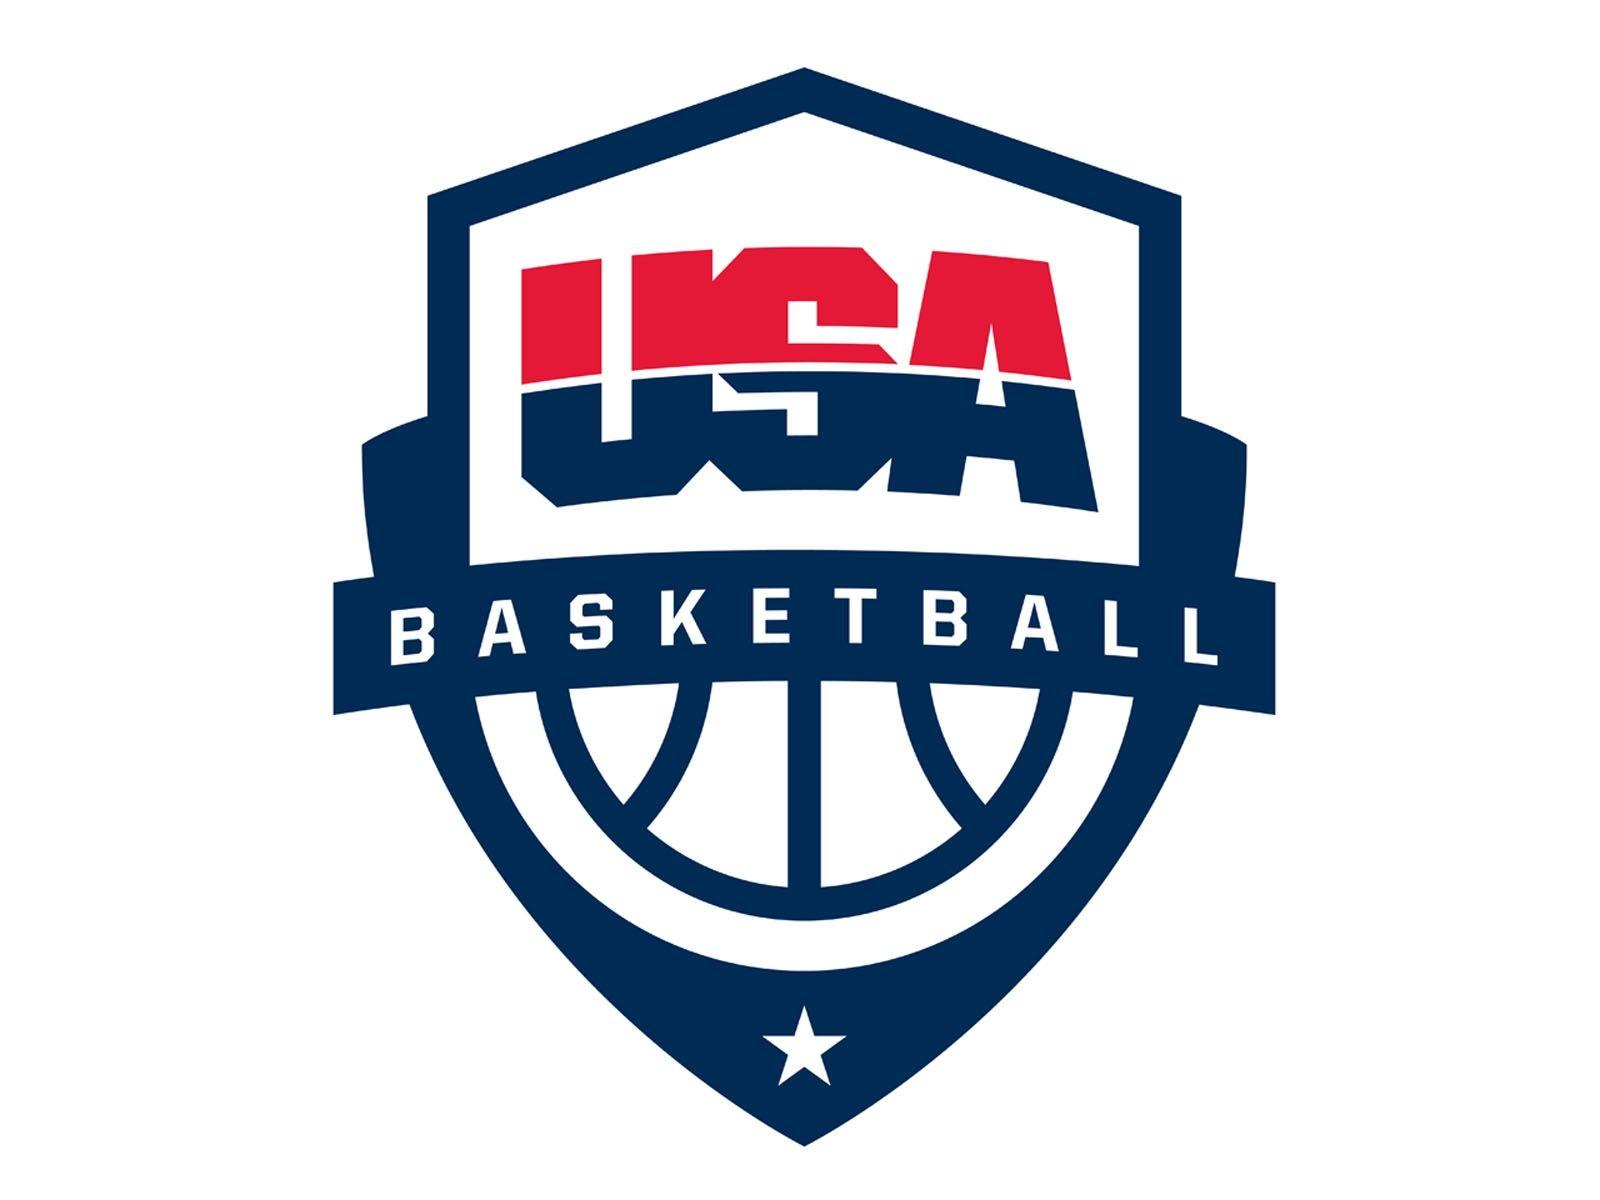 New-USA-Basketball-Logo-Wallpaper.jpg (1600×1200)